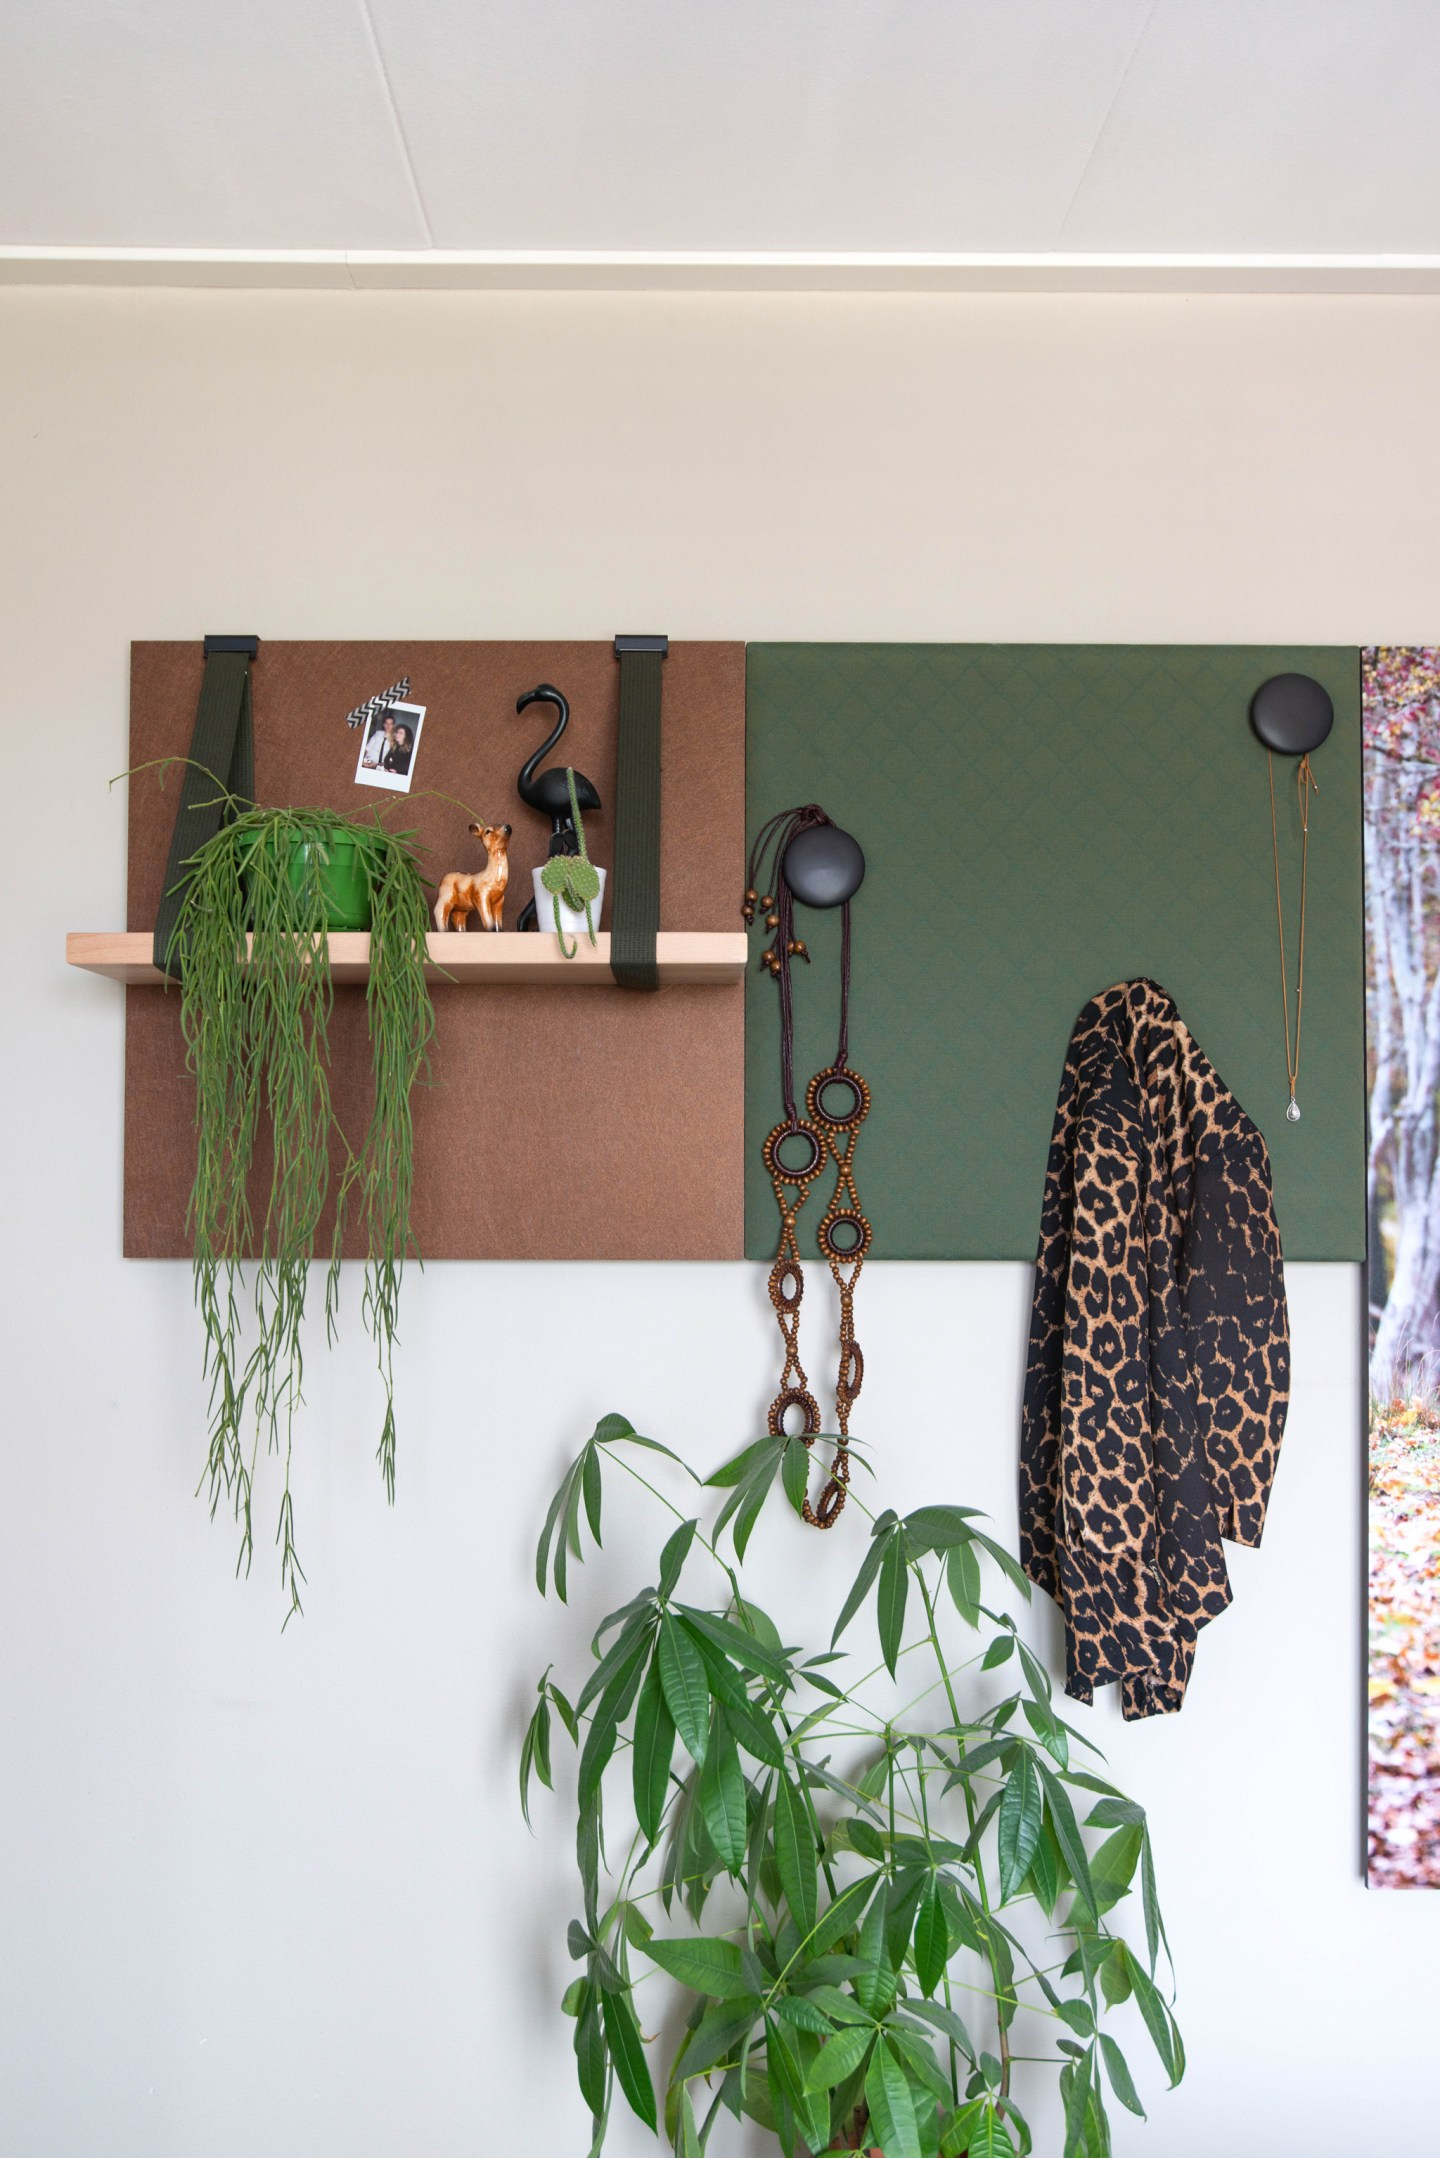 keeelly91 dock four style pads wandsysteem wooninspiratie interieur blogger home idea slaapkamer inspiratie interior groen planten